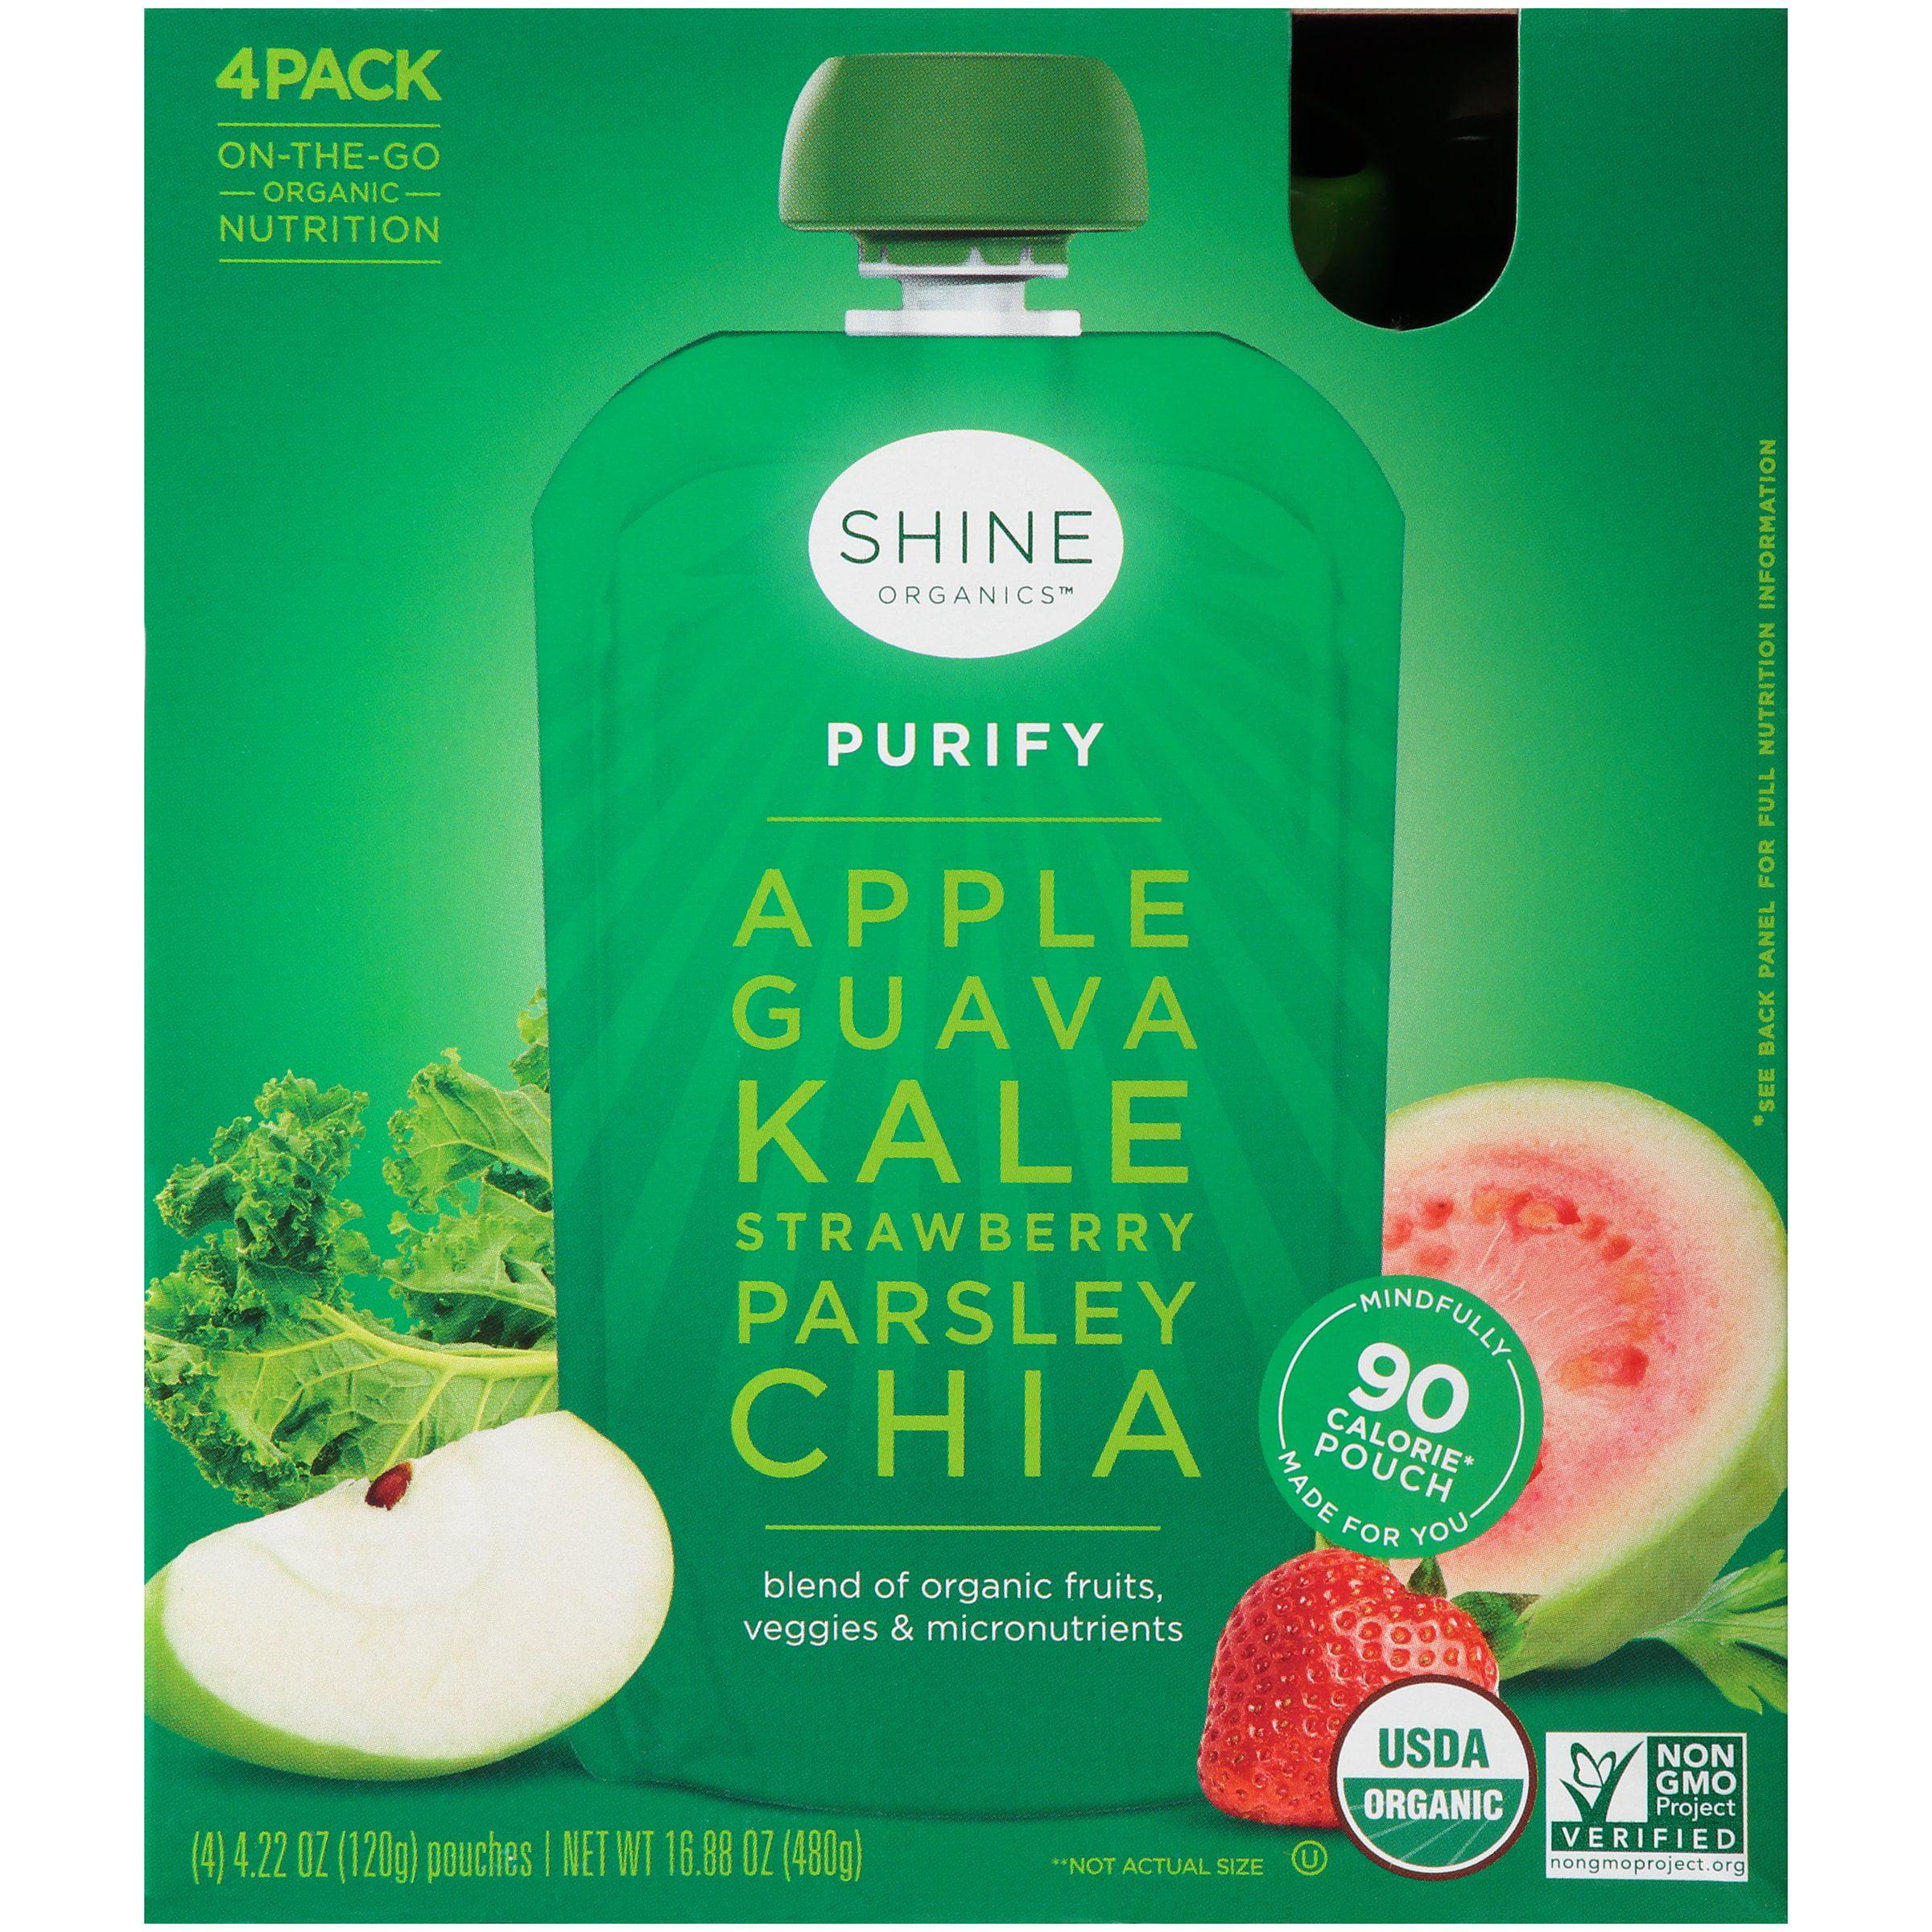 Shine Organic Purify Organic Snack 4-4.22 oz. Pouches